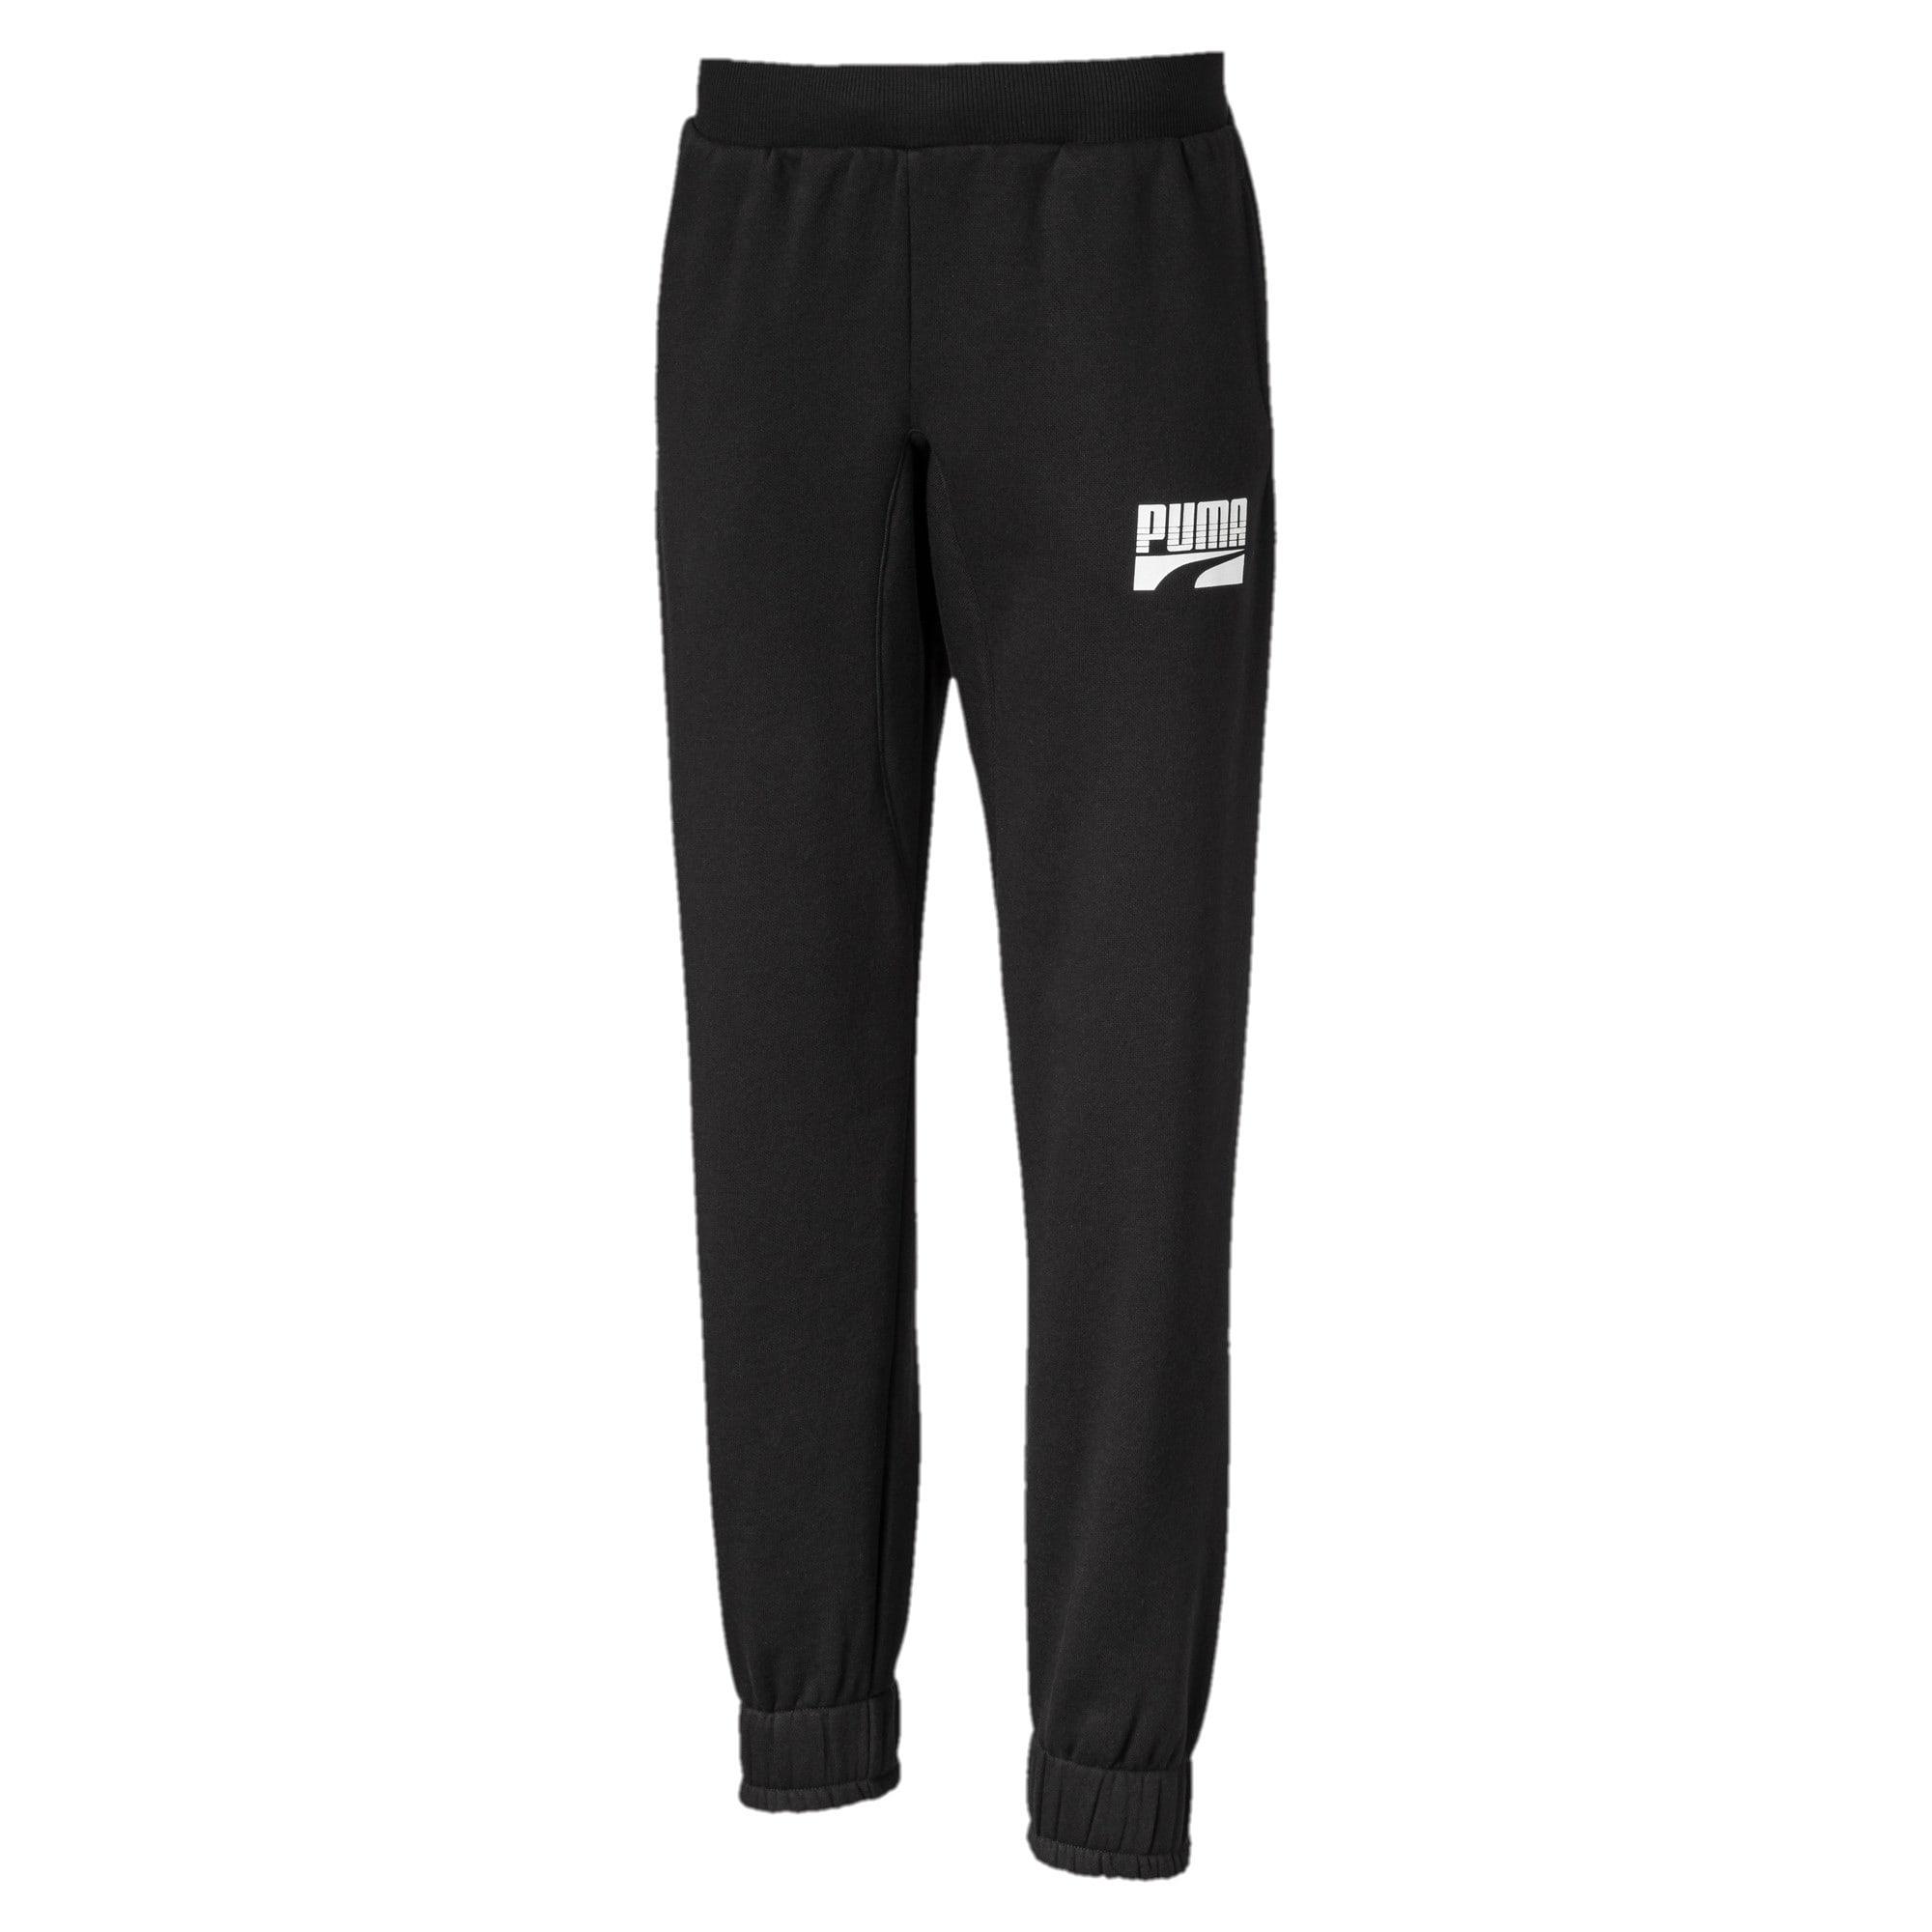 Thumbnail 1 of Knitted Boys' Rebel Sweatpants, Puma Black, medium-IND